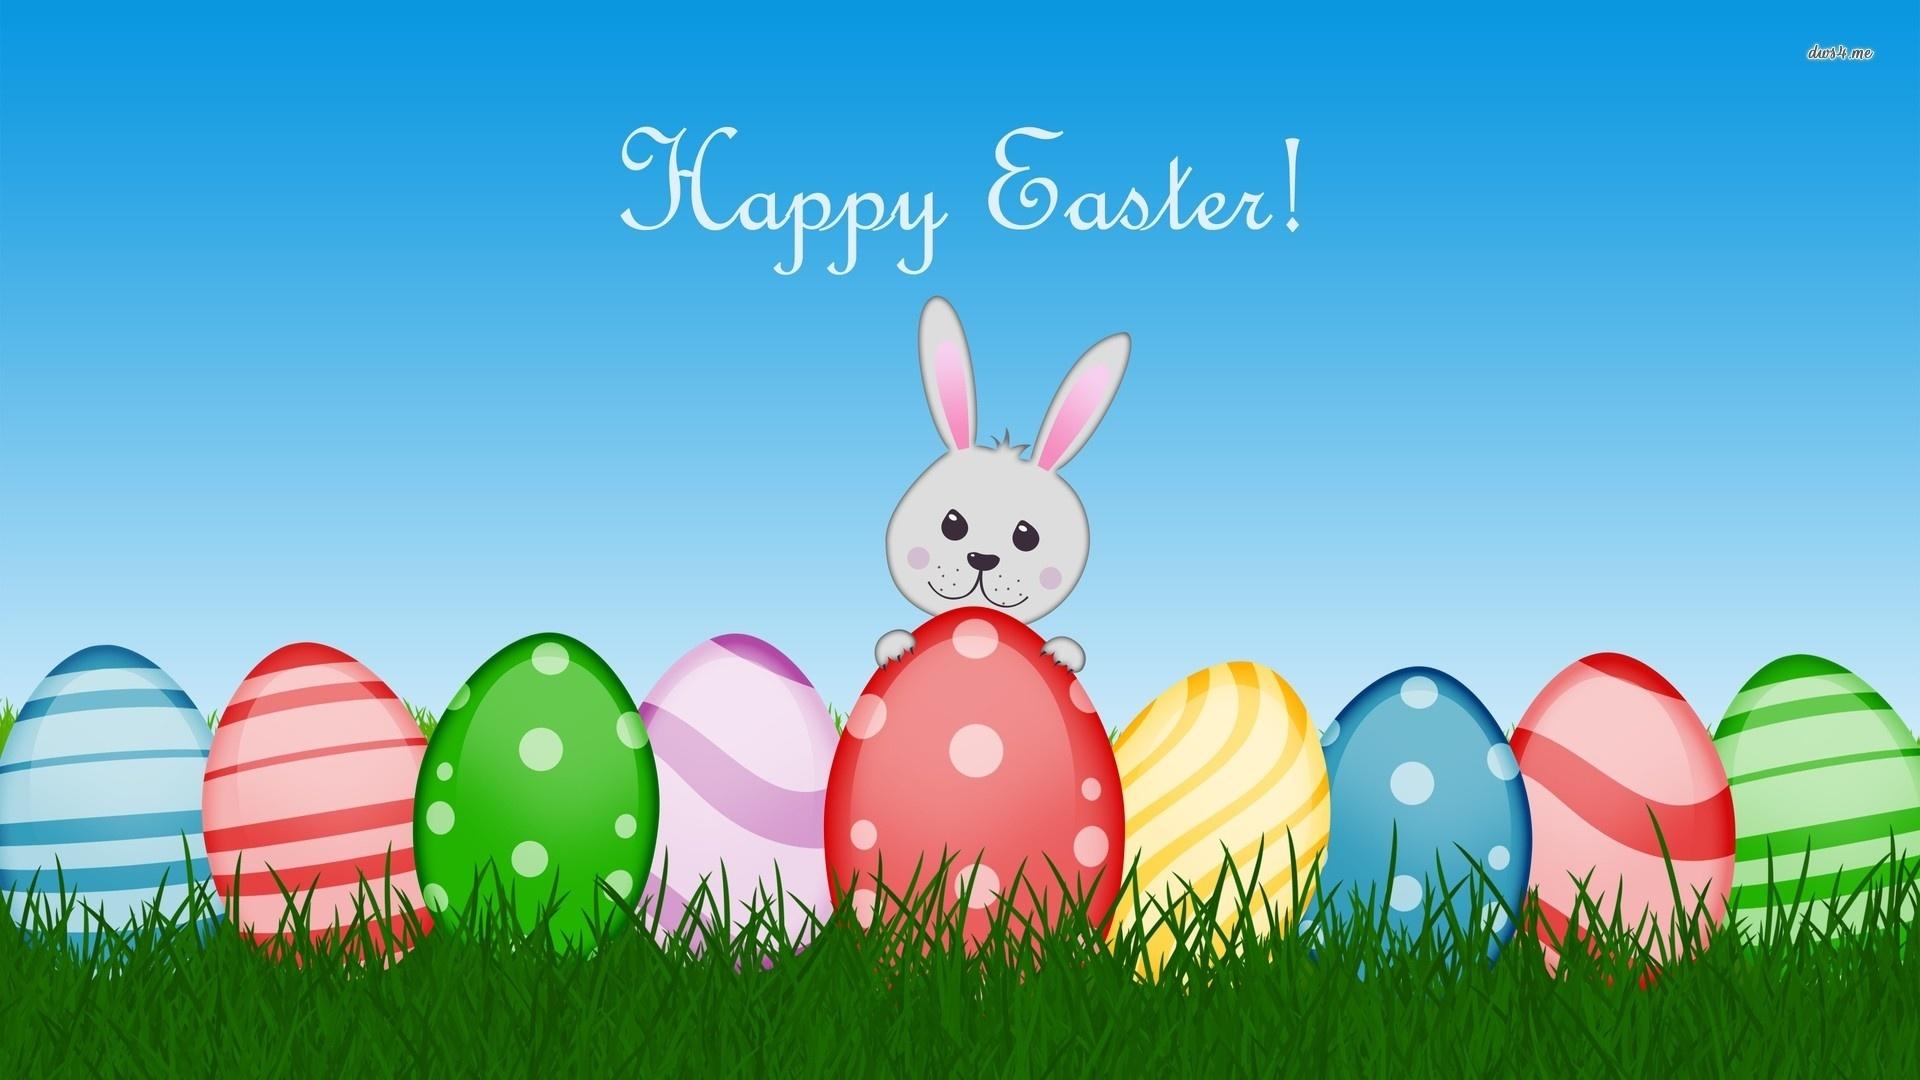 Happy Easter wallpaper photo hd